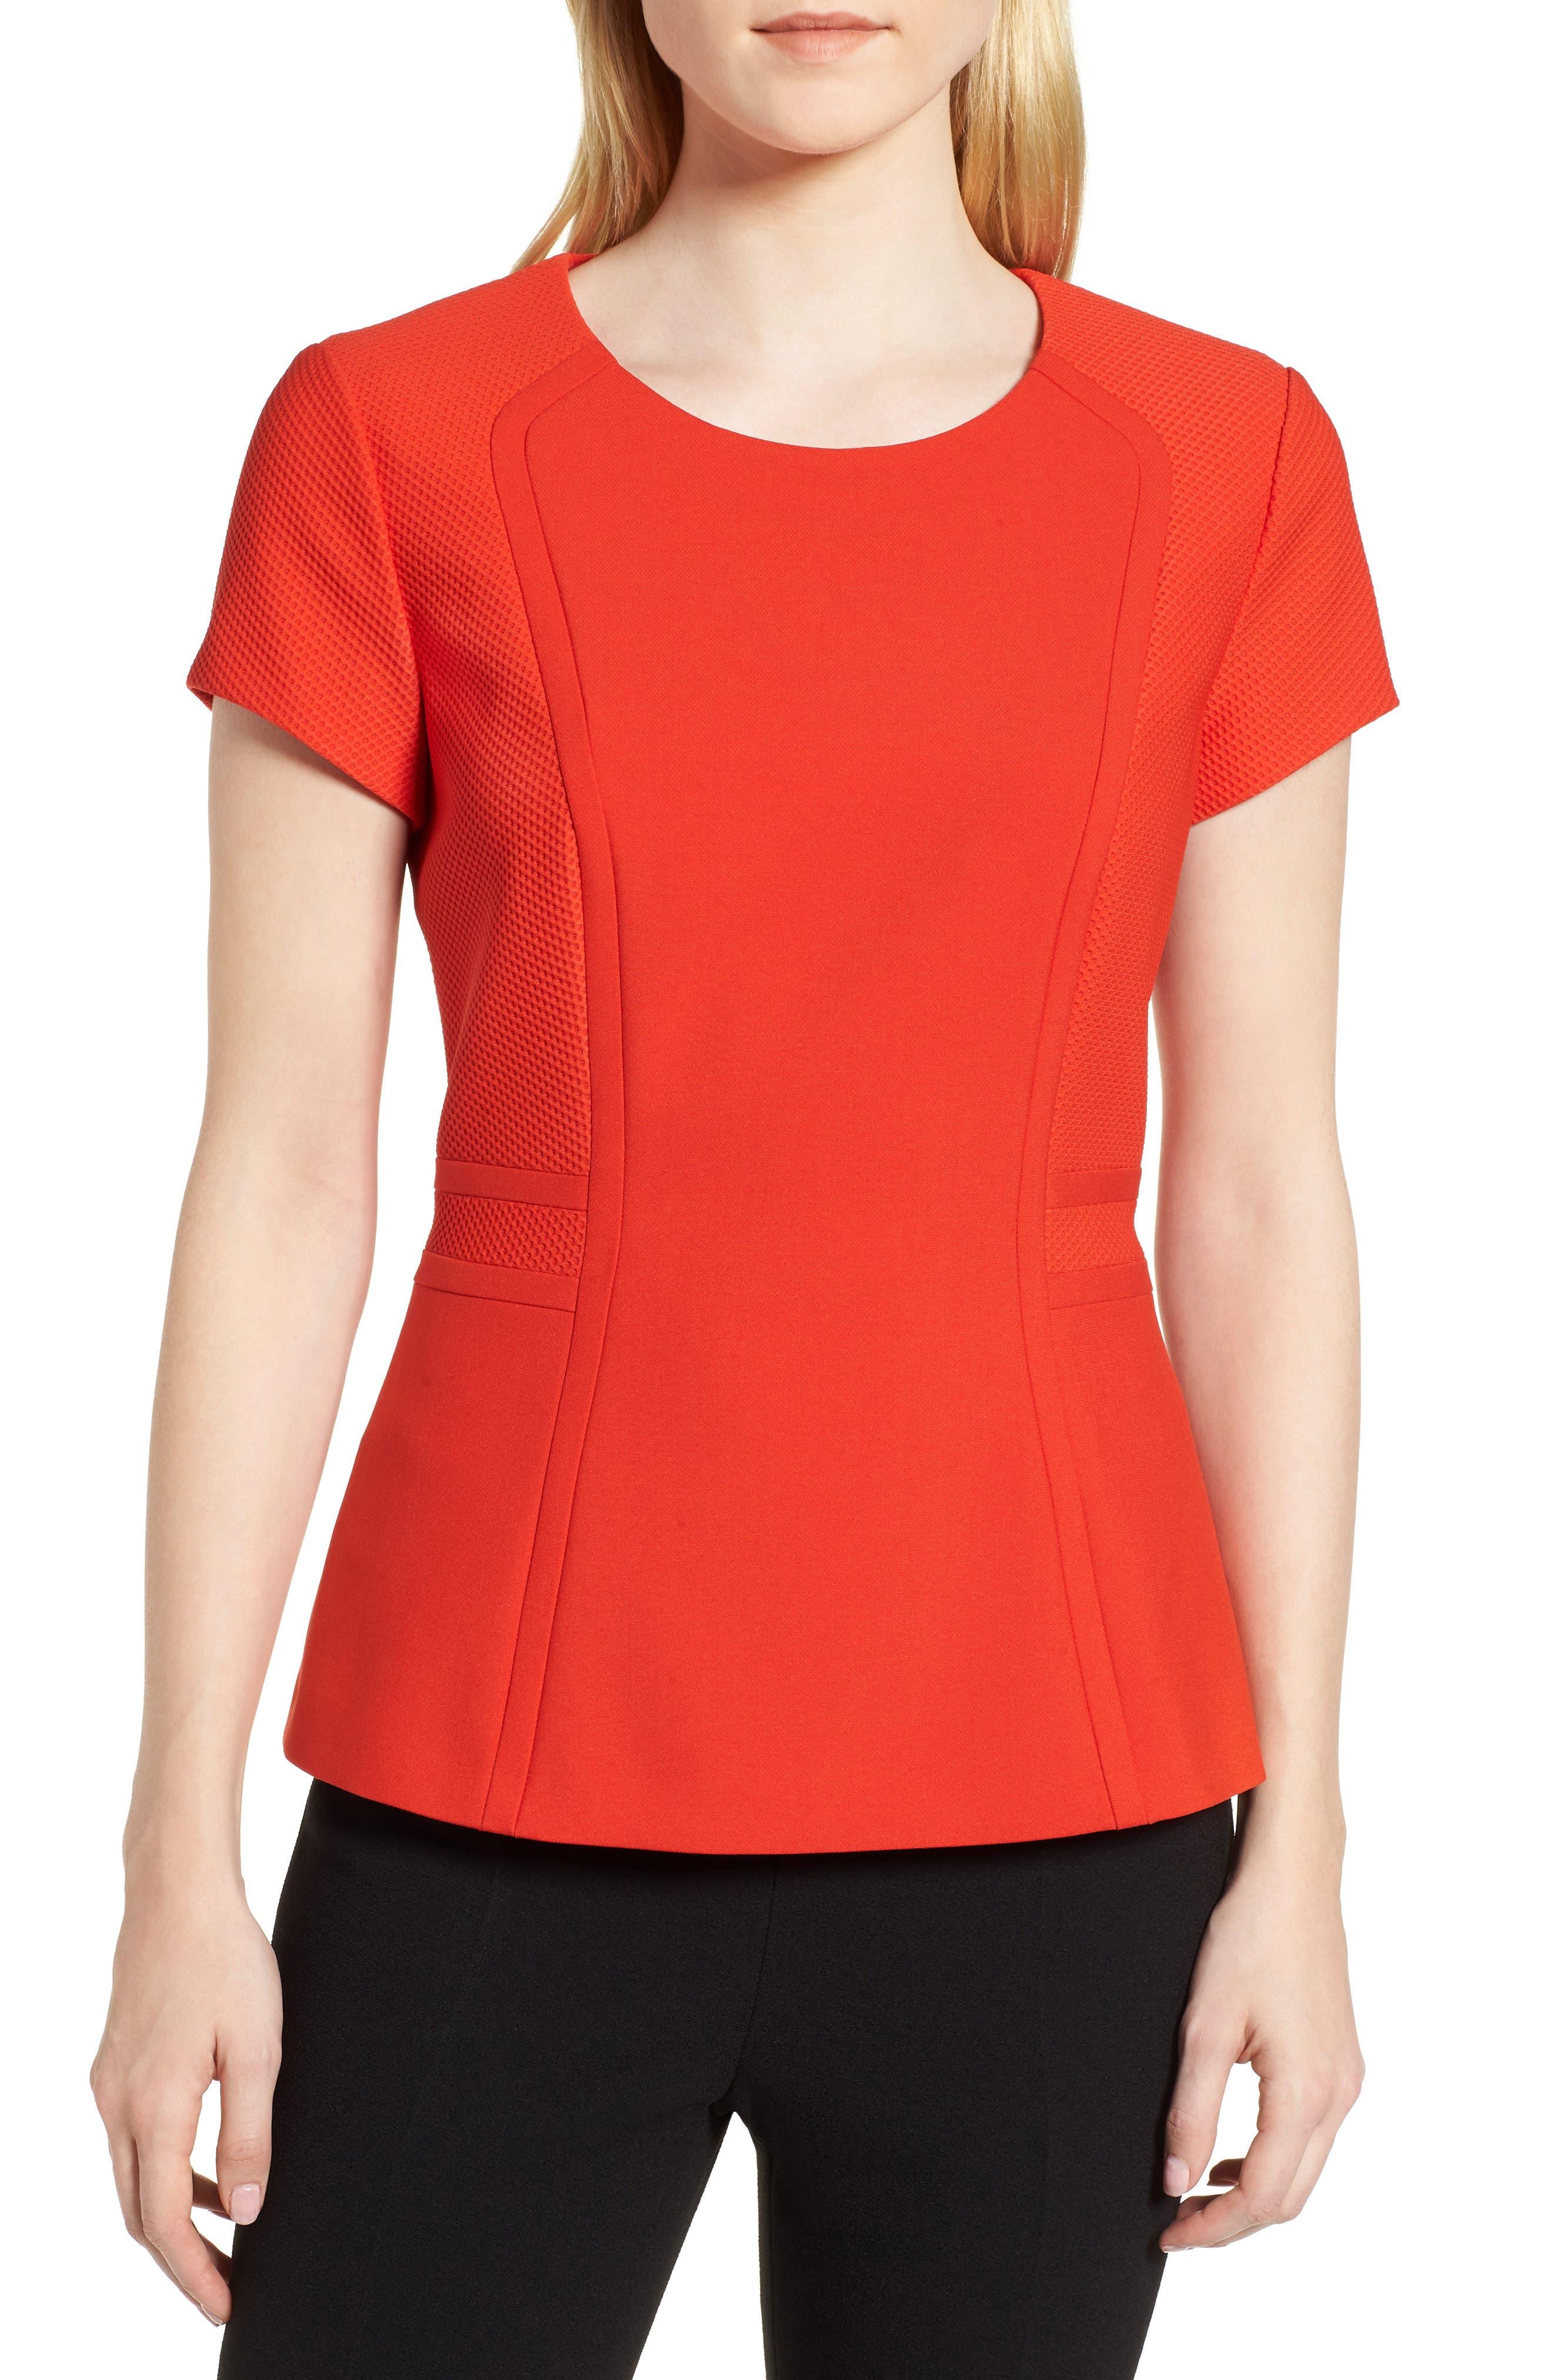 Idama Ponte Top,                         Main,                         color, Sunset Orange